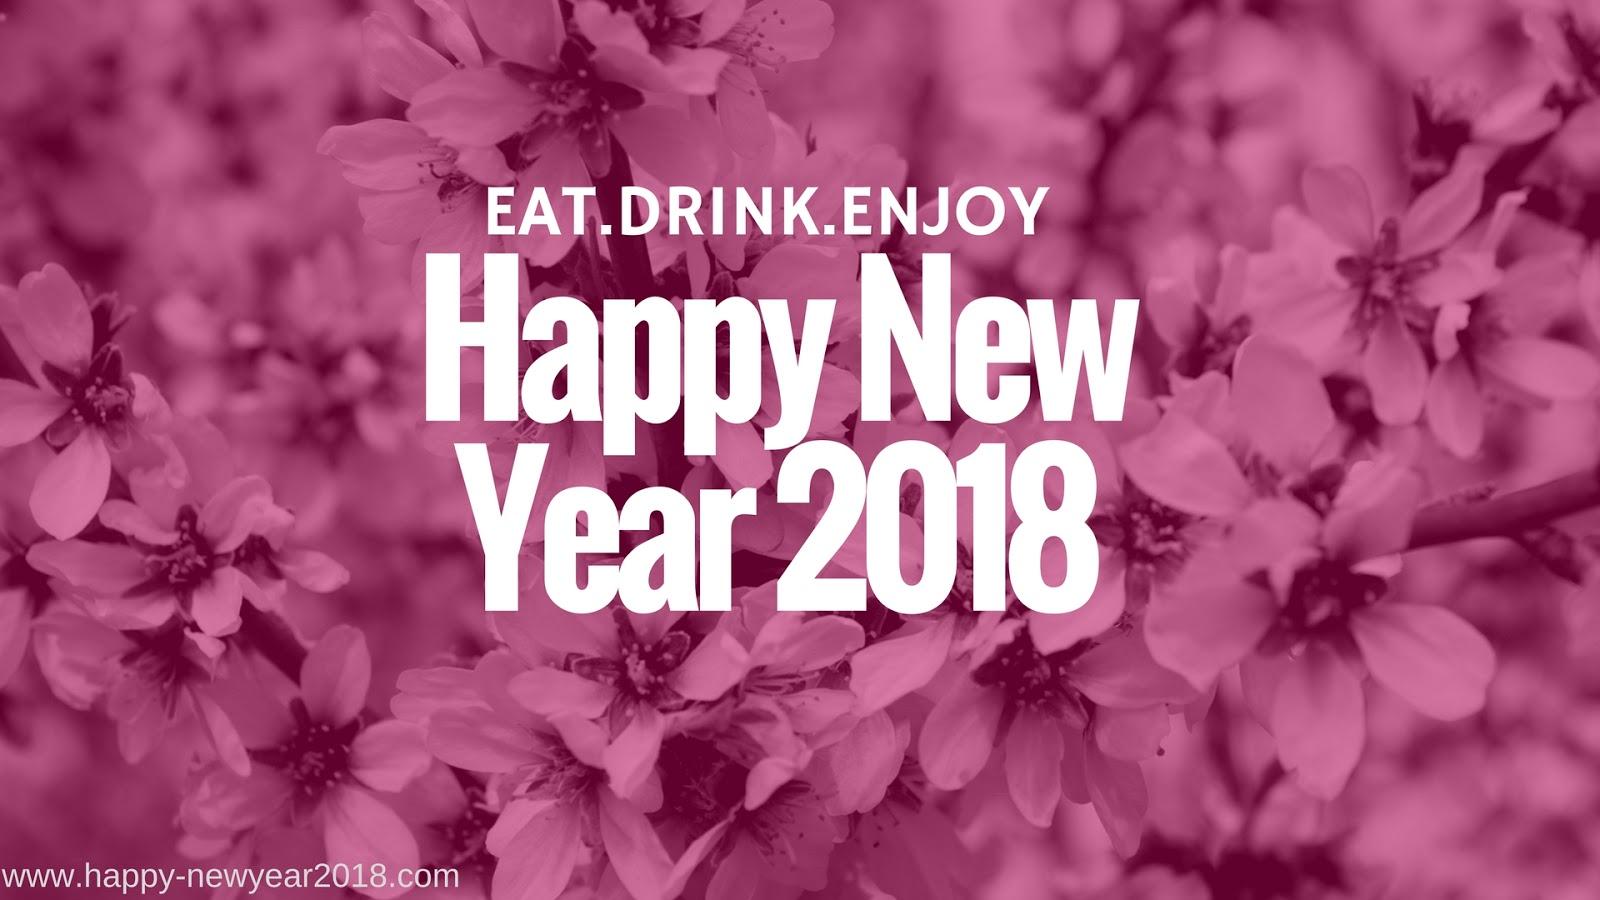 hd wallpaper 2018 happy new year